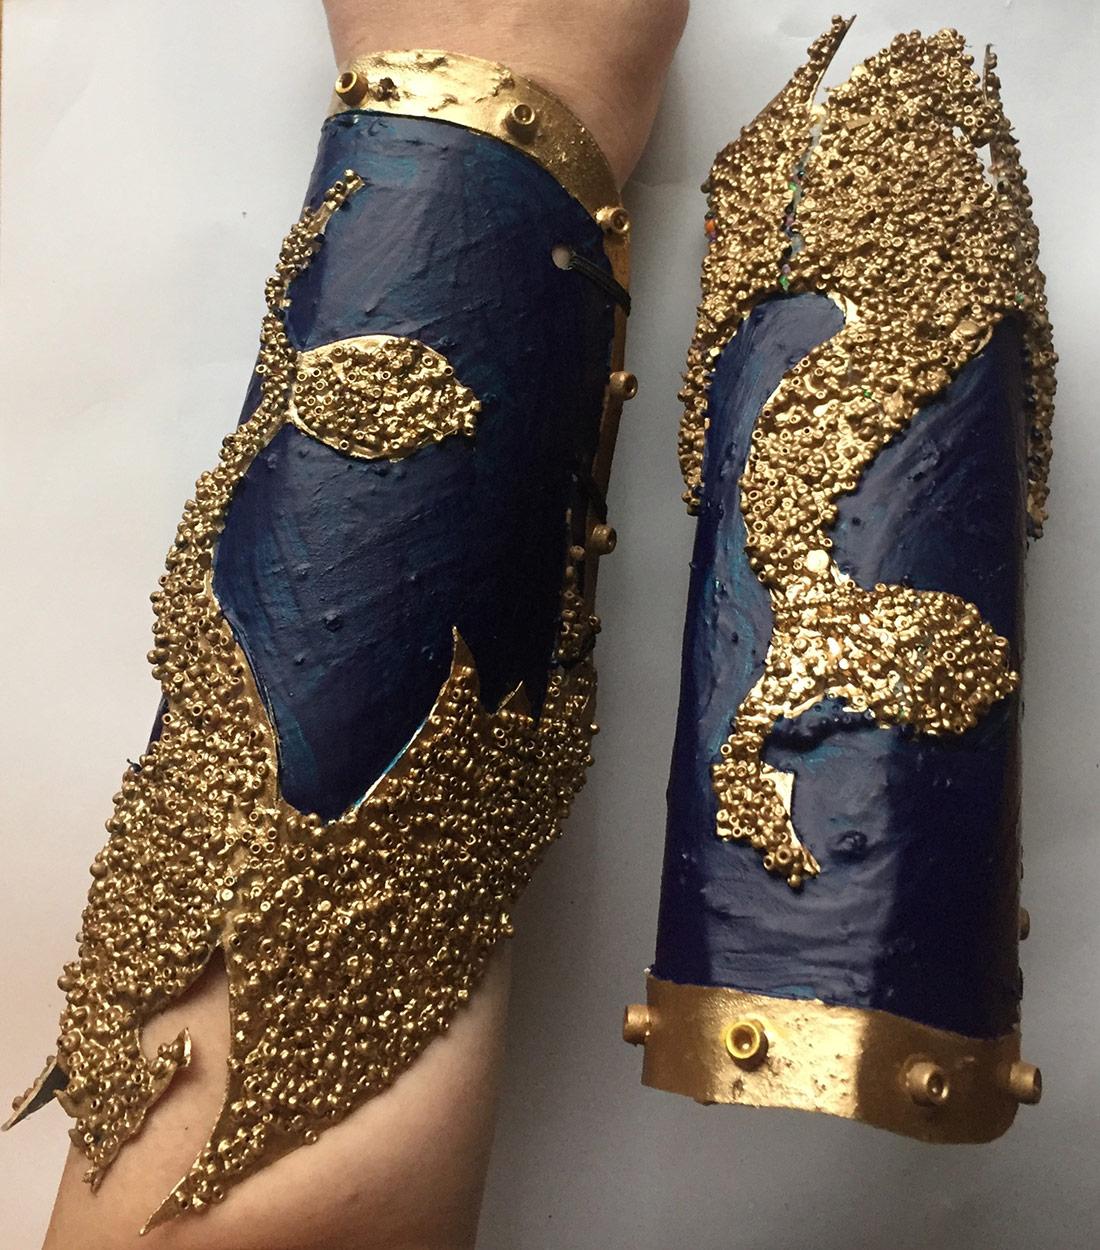 cosplay arm bracers